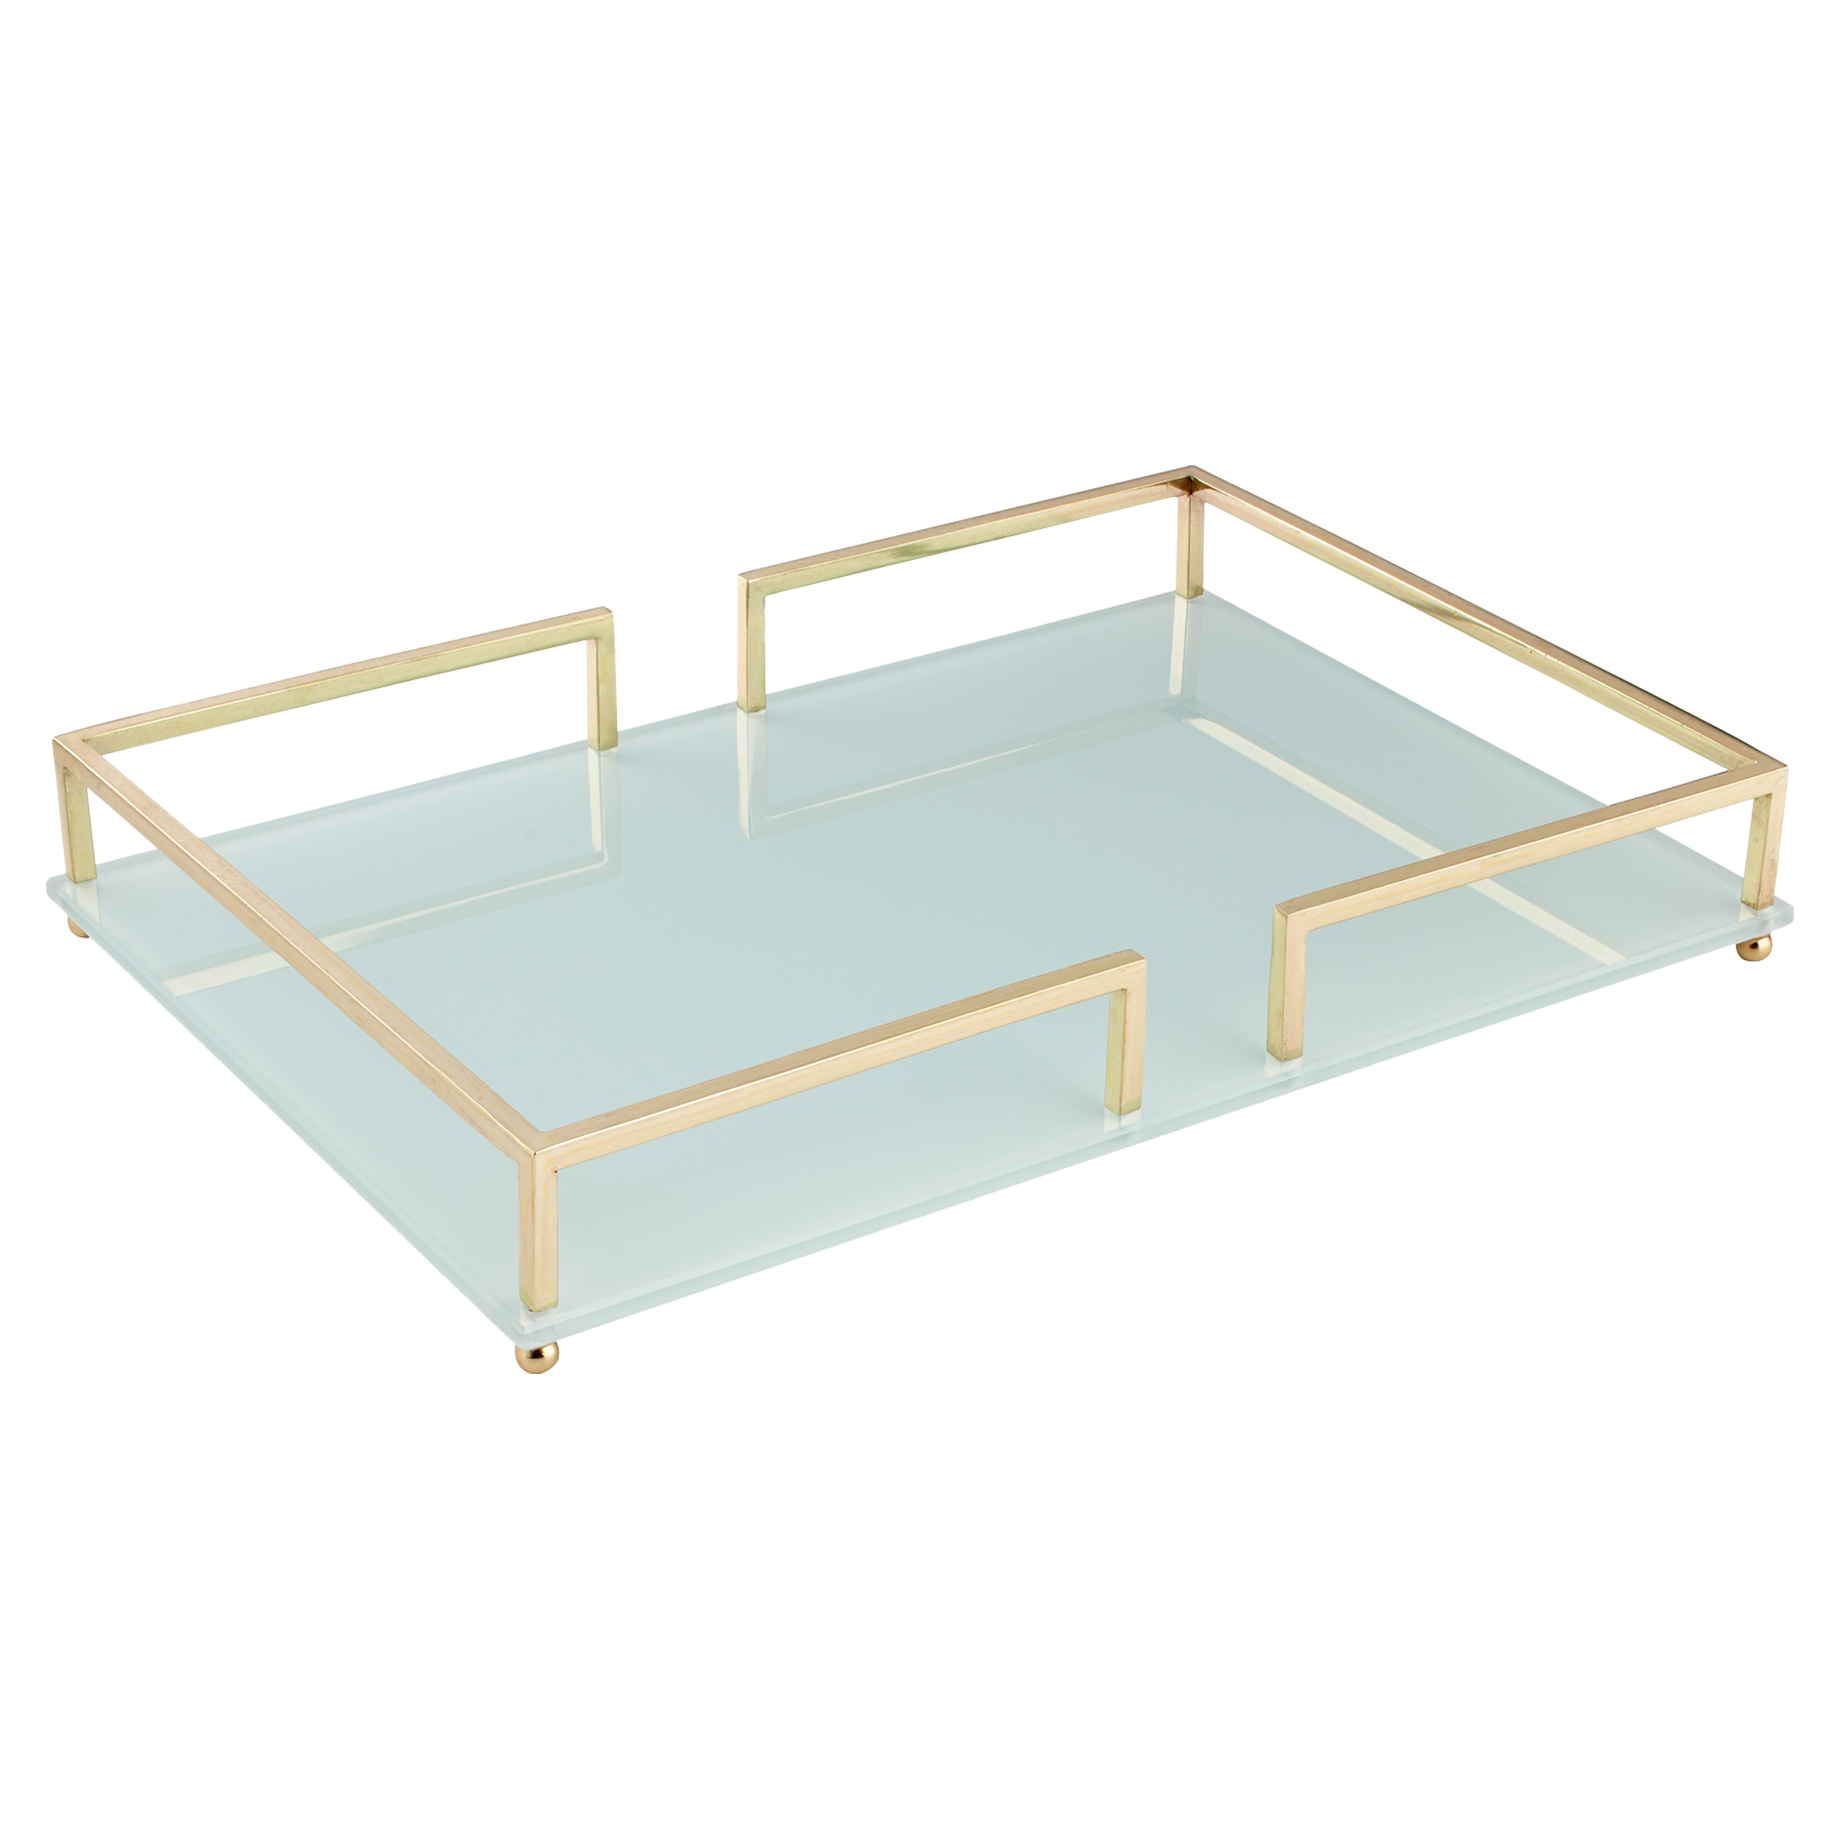 Tima Modern Classic Ice Blue Gold Trim Tray - L